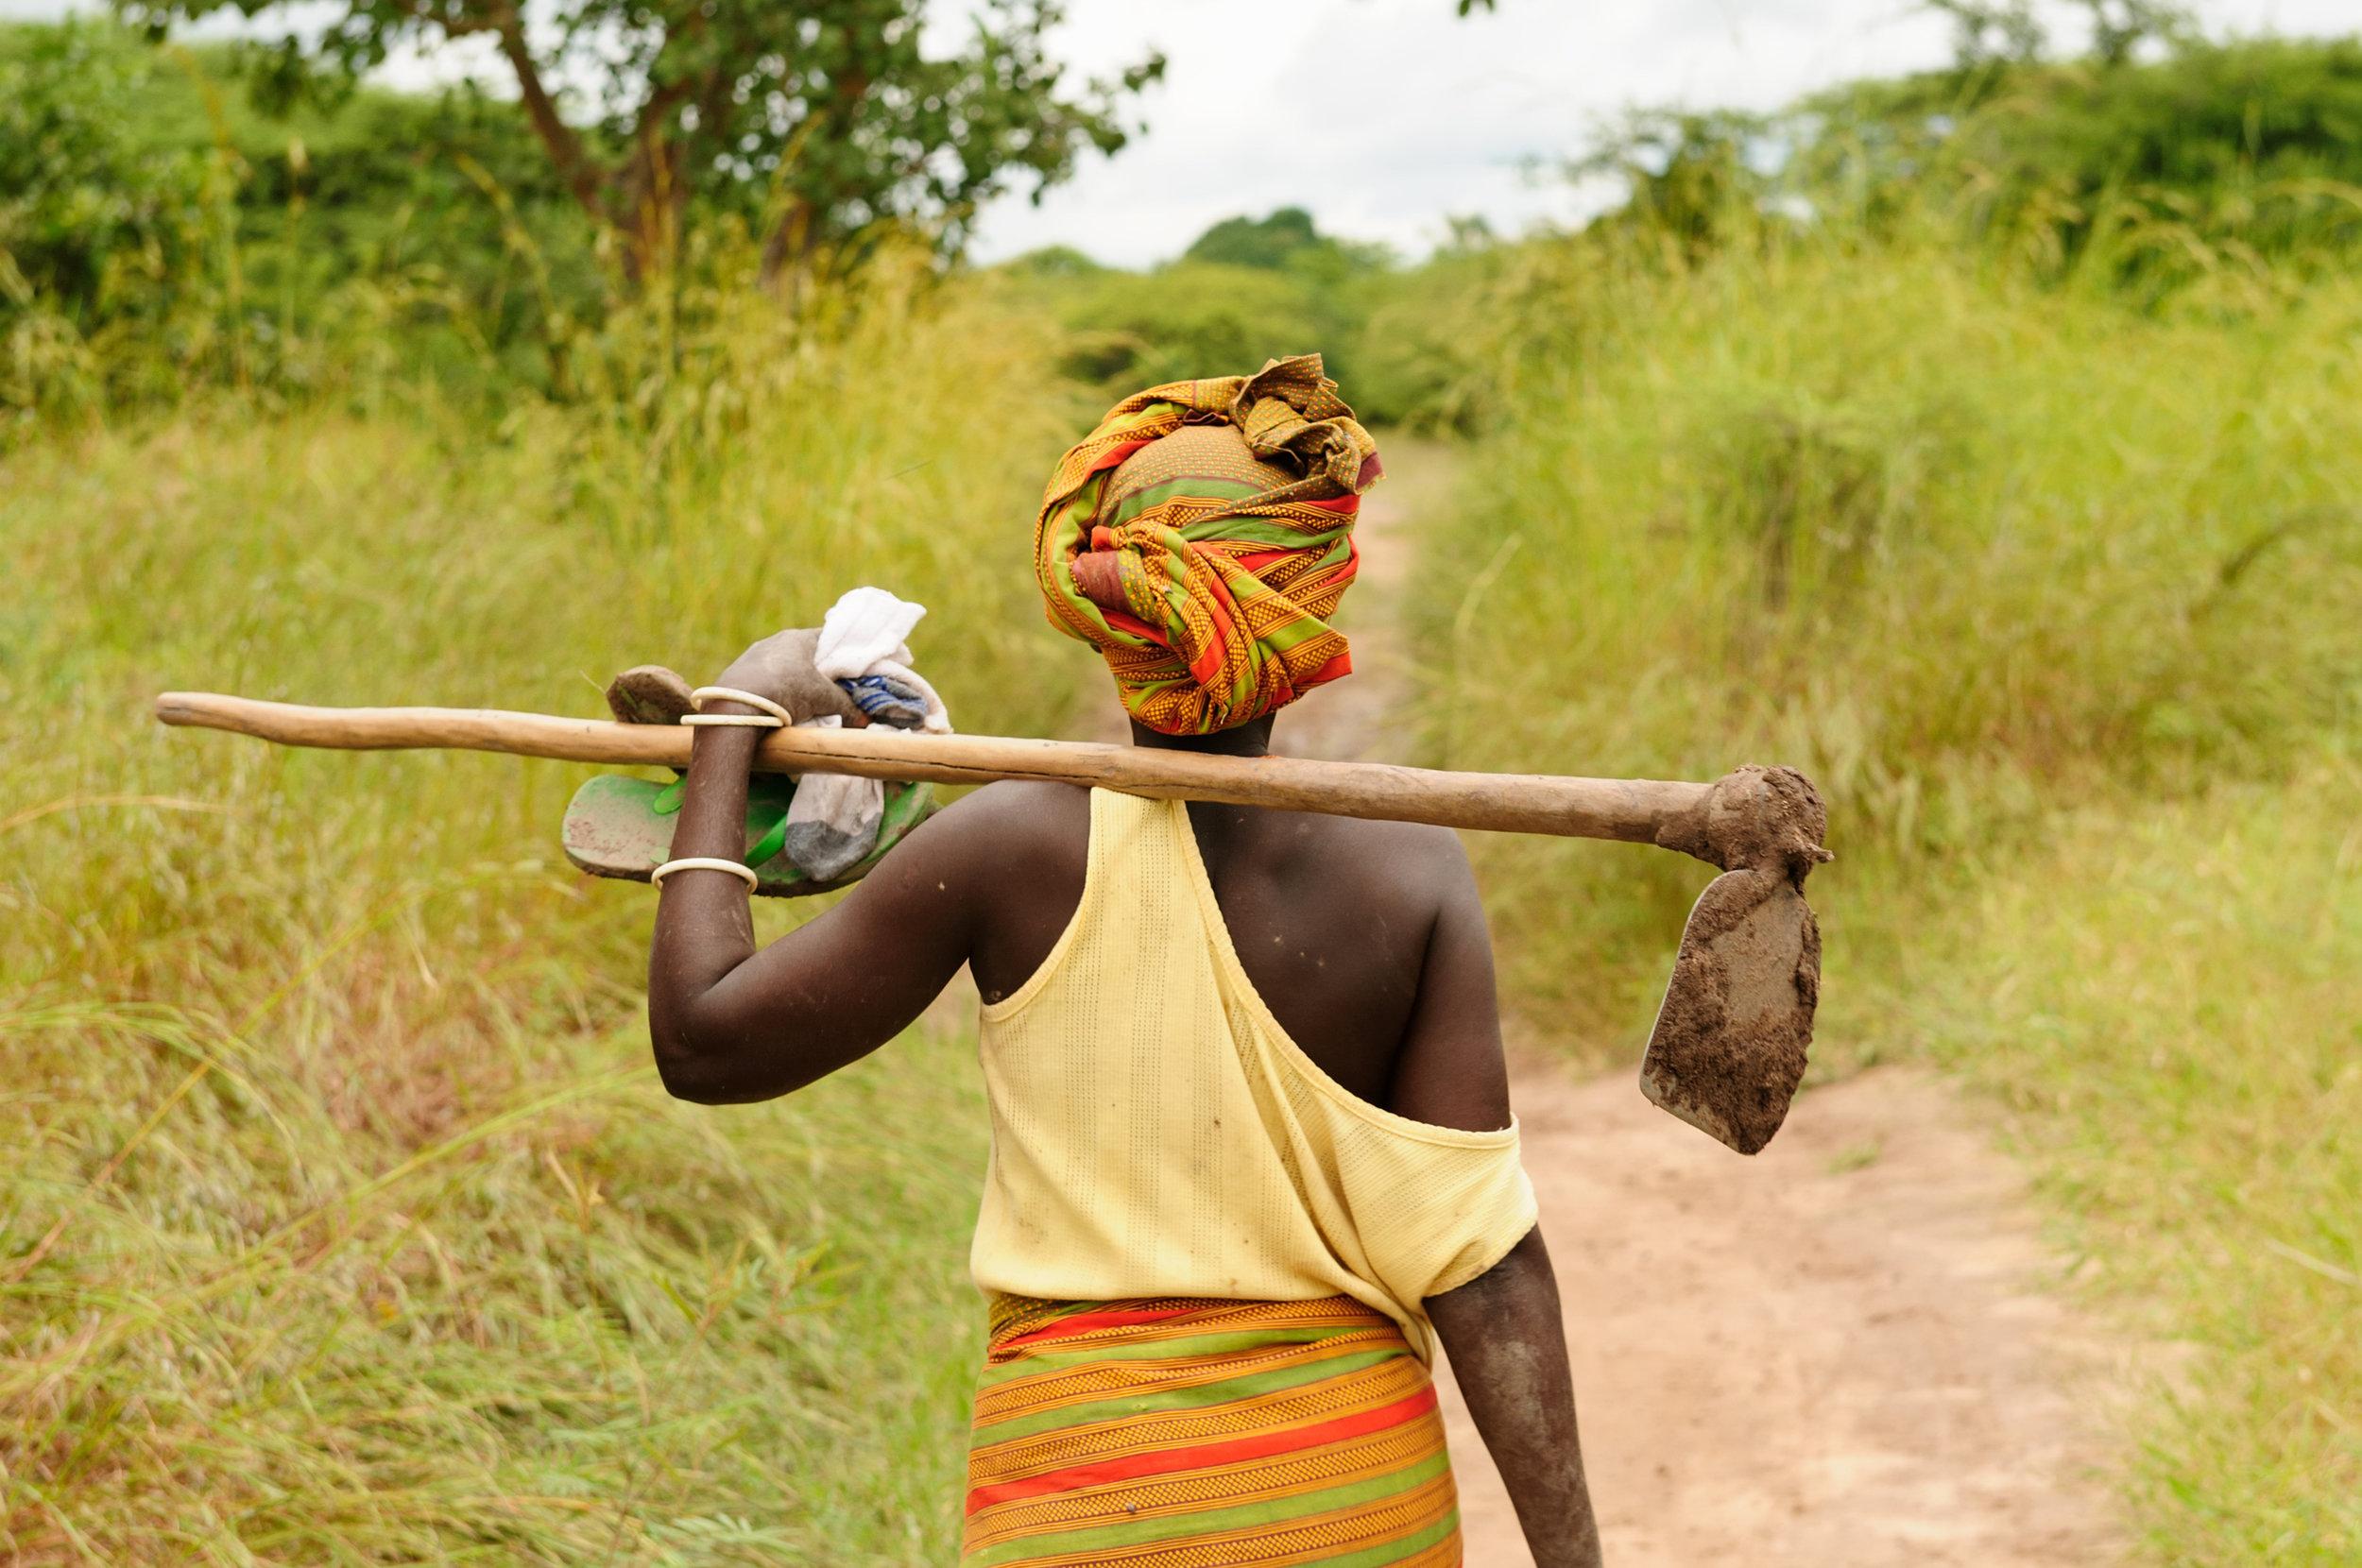 Angola-woman-farmer-field-walking-Africa-Roots-of-Peace-ROP.jpg